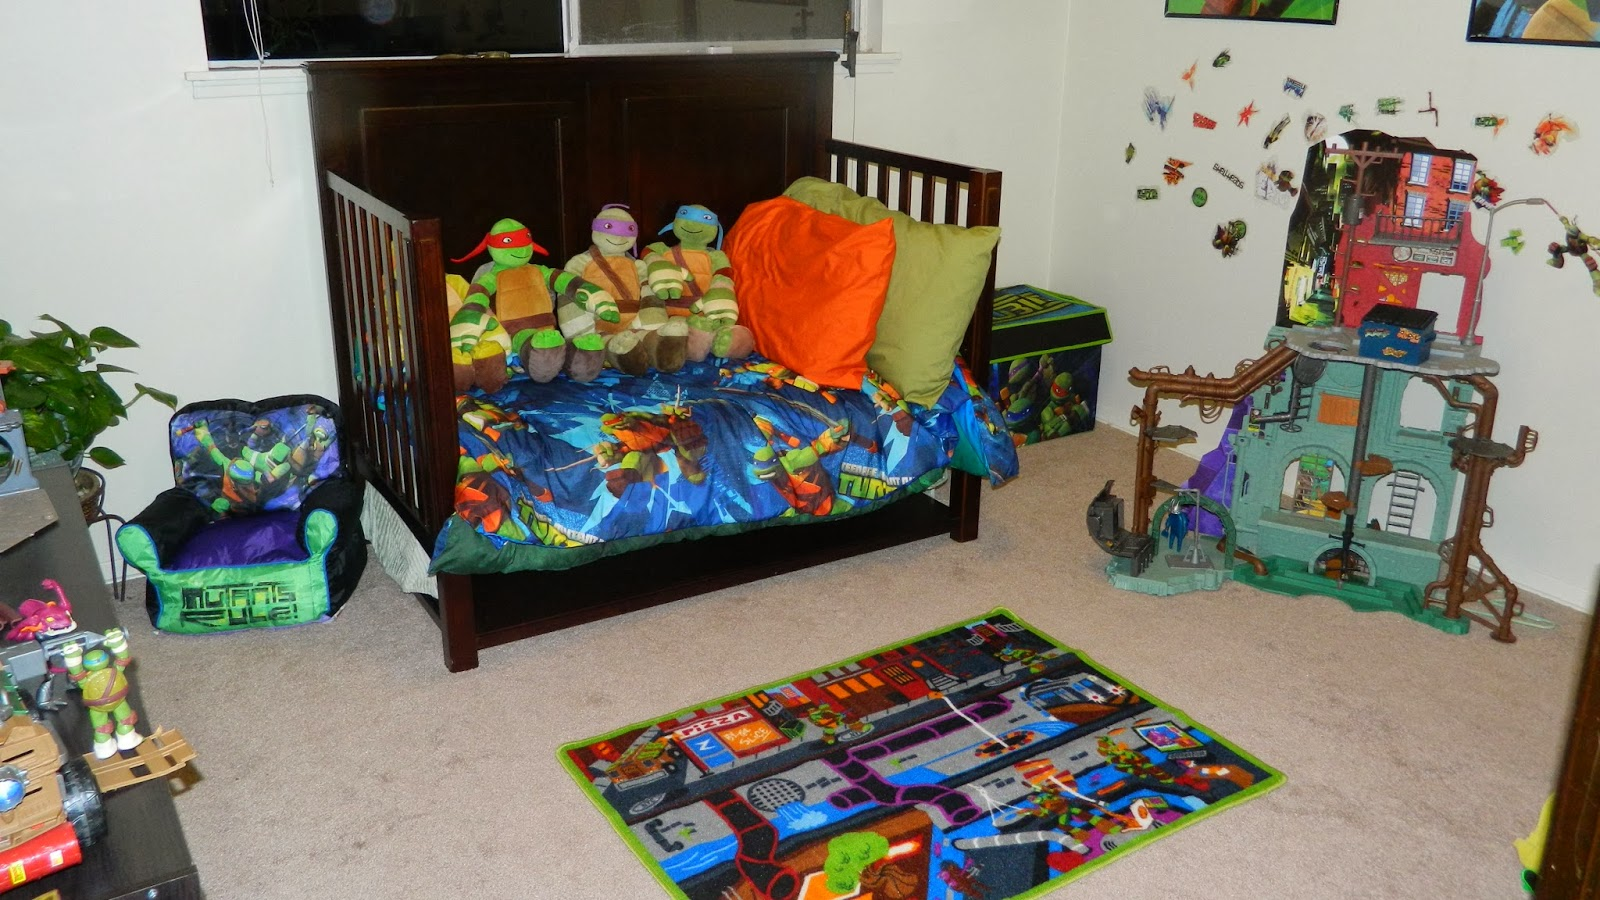 Ninja turtle bedroom - How We Turned My Son S Room Into An Epic Tmnt Room